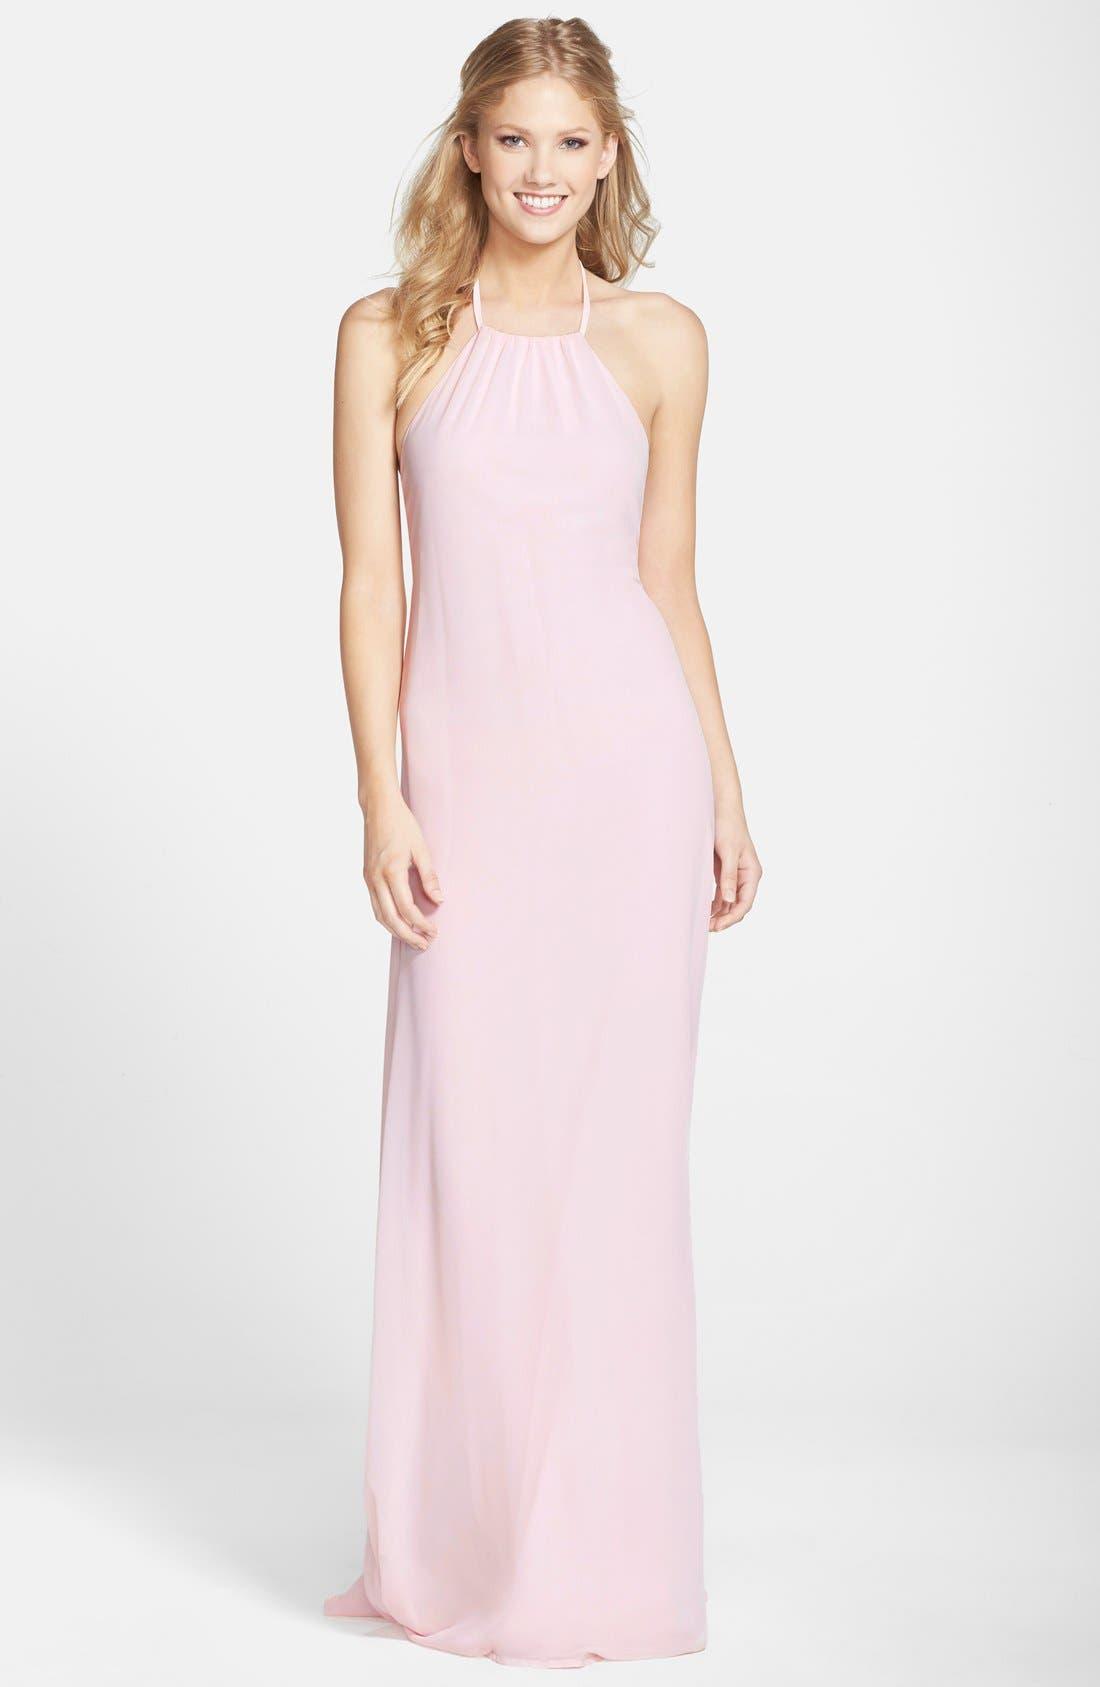 'Jordan' Open Back Chiffon Halter Gown,                         Main,                         color, 902